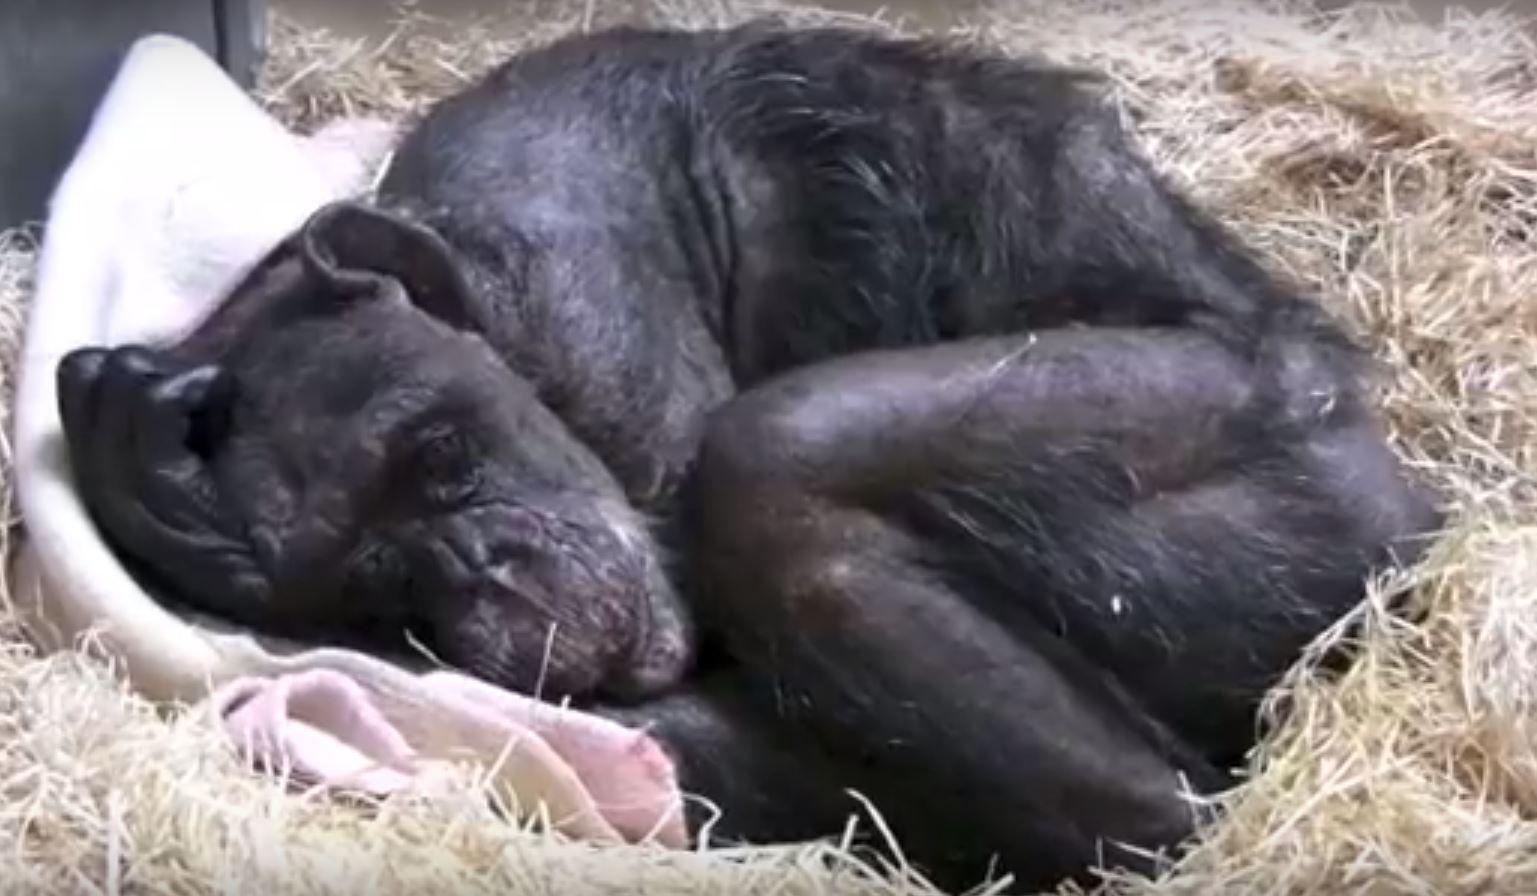 Sick chimpanzee lays in straw